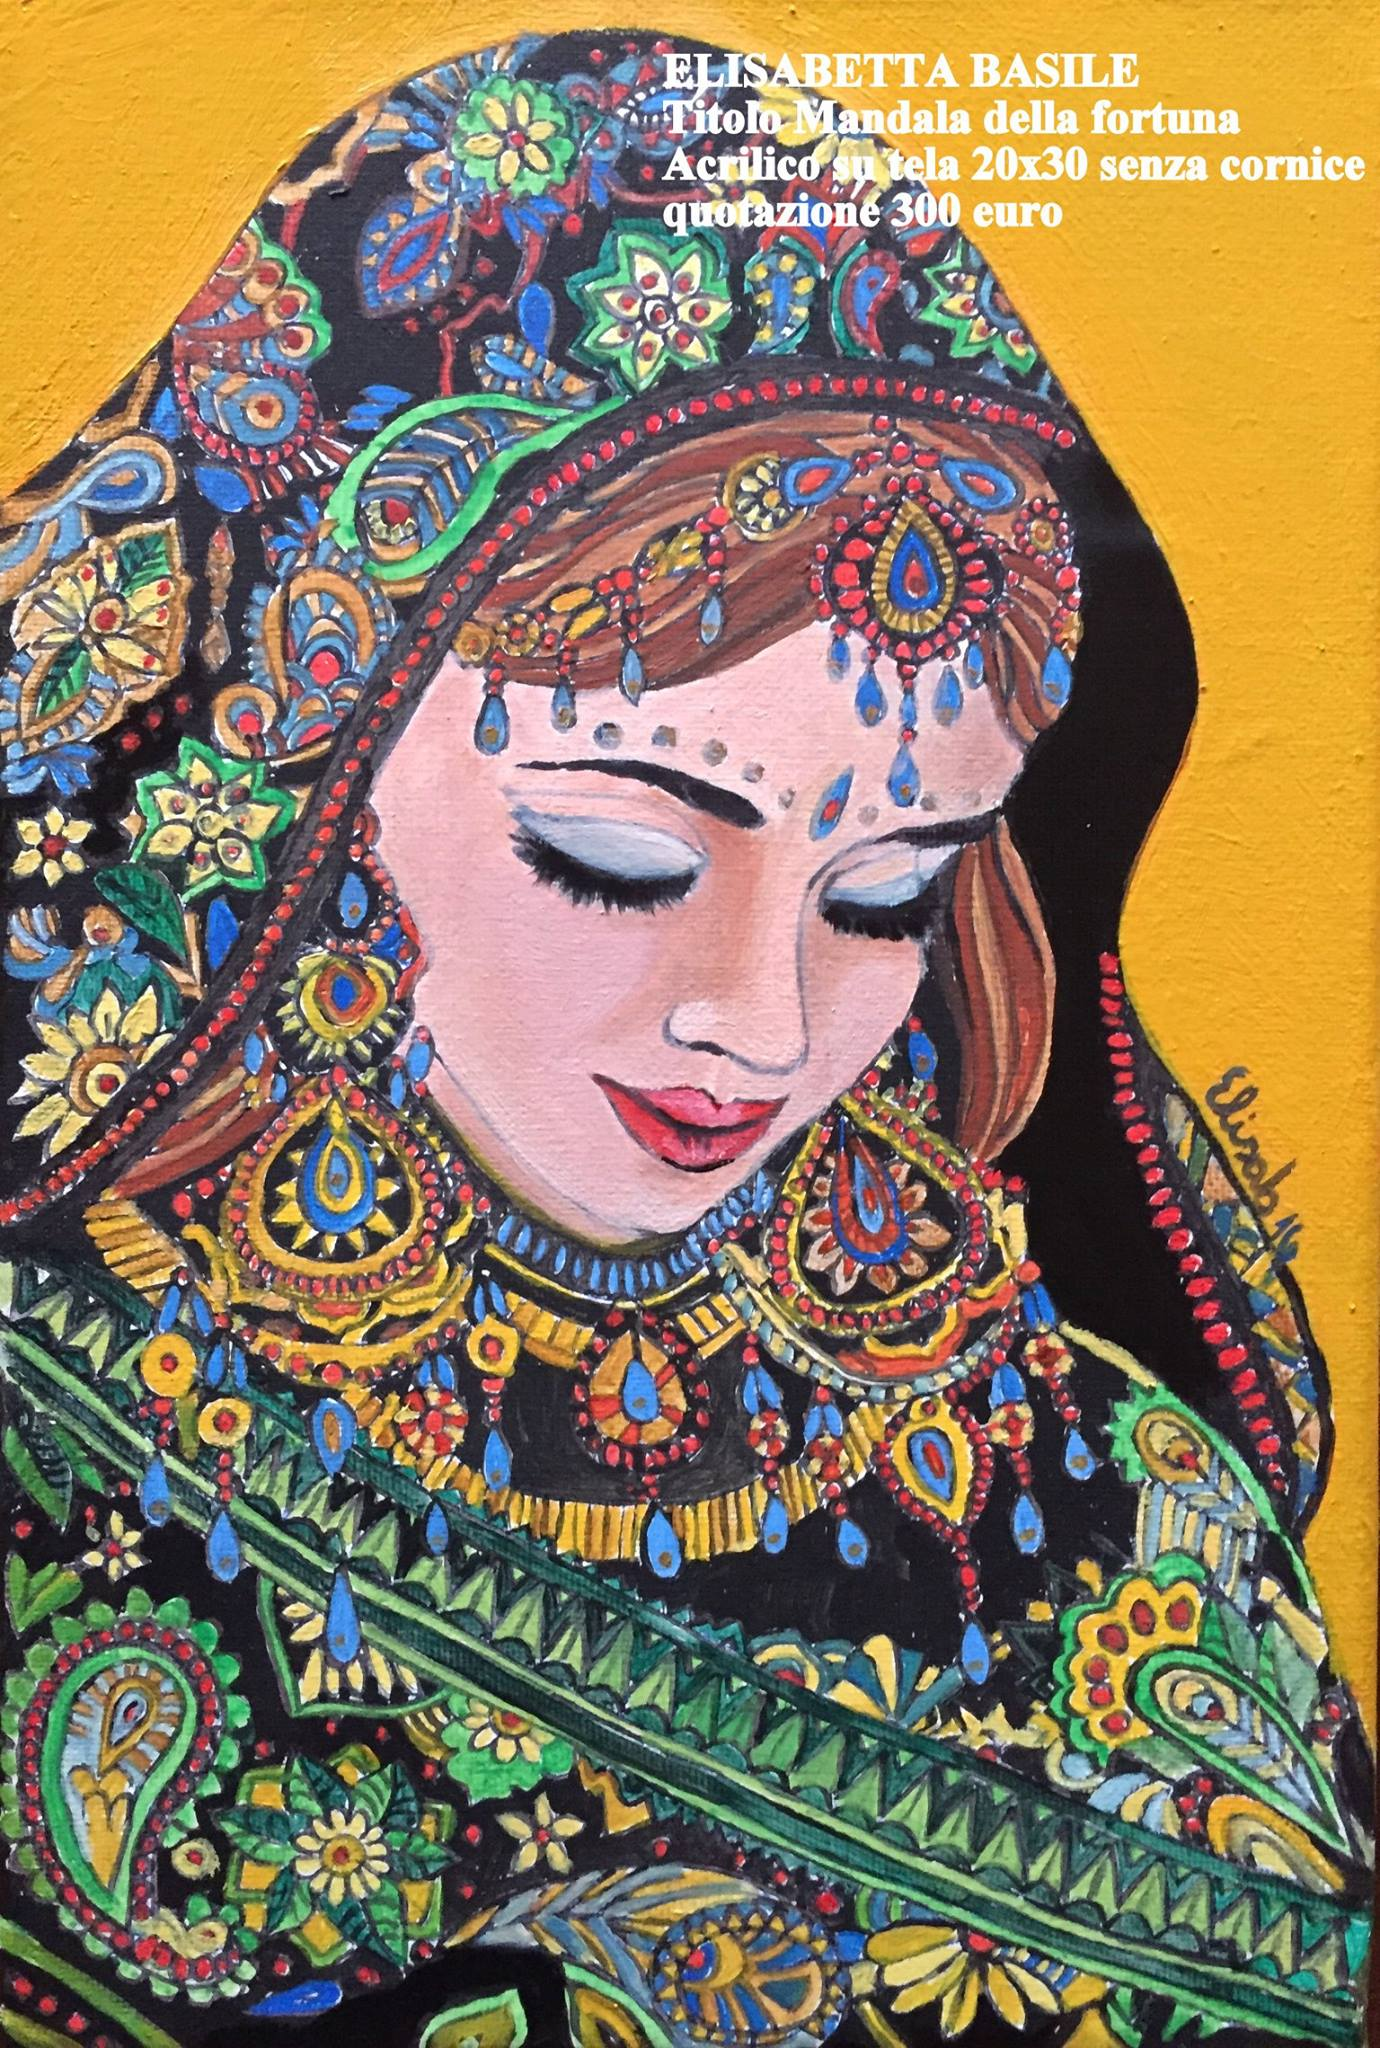 Dipinto Mandala della fortuna. Acrilico su tela. Artista Elisabetta Basile